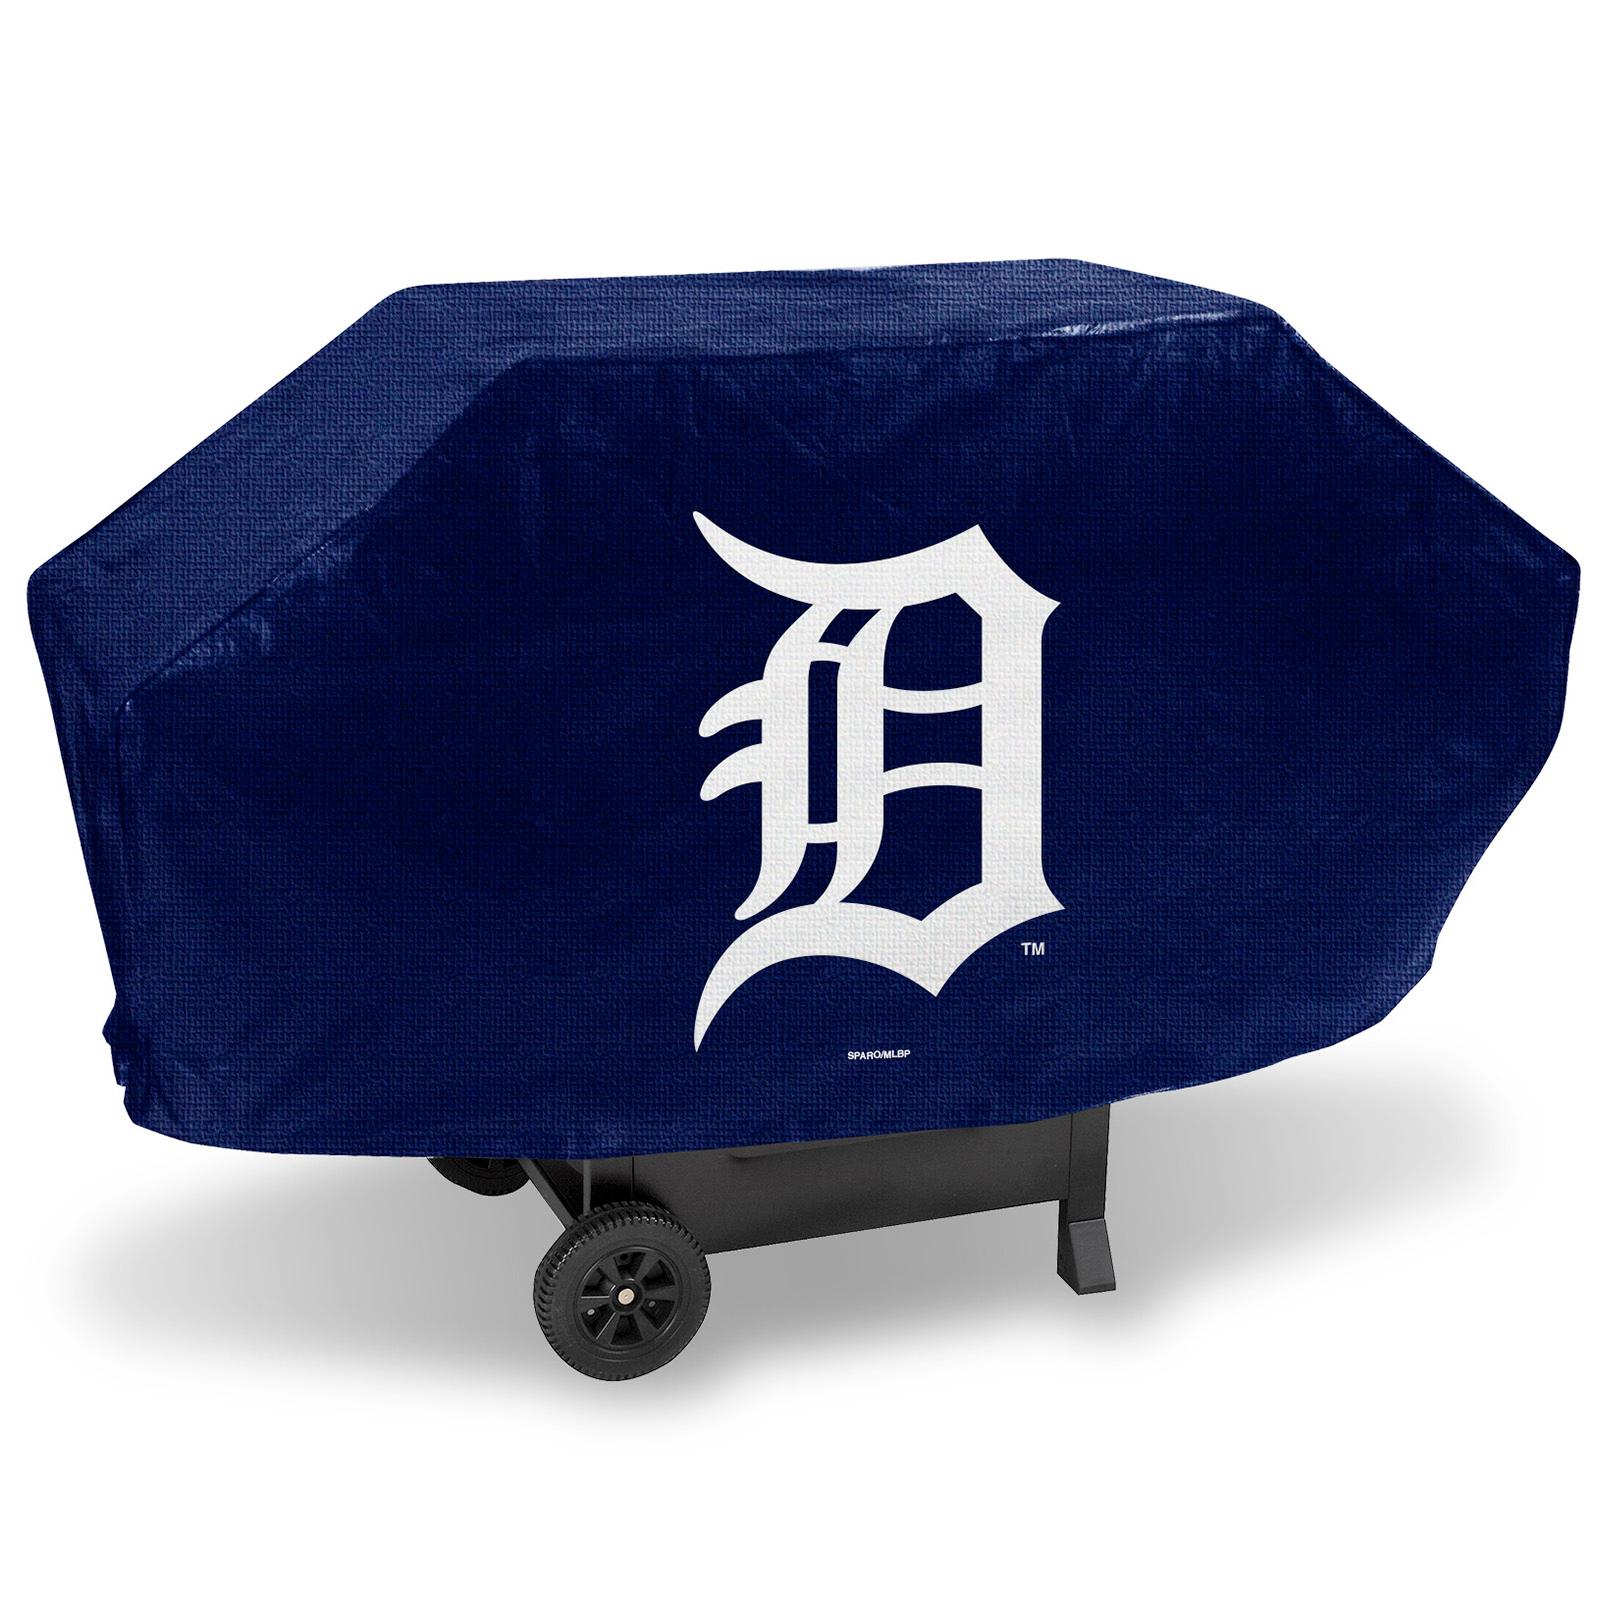 Detroit Tigers Sparo Executive Grill Cover - No Size